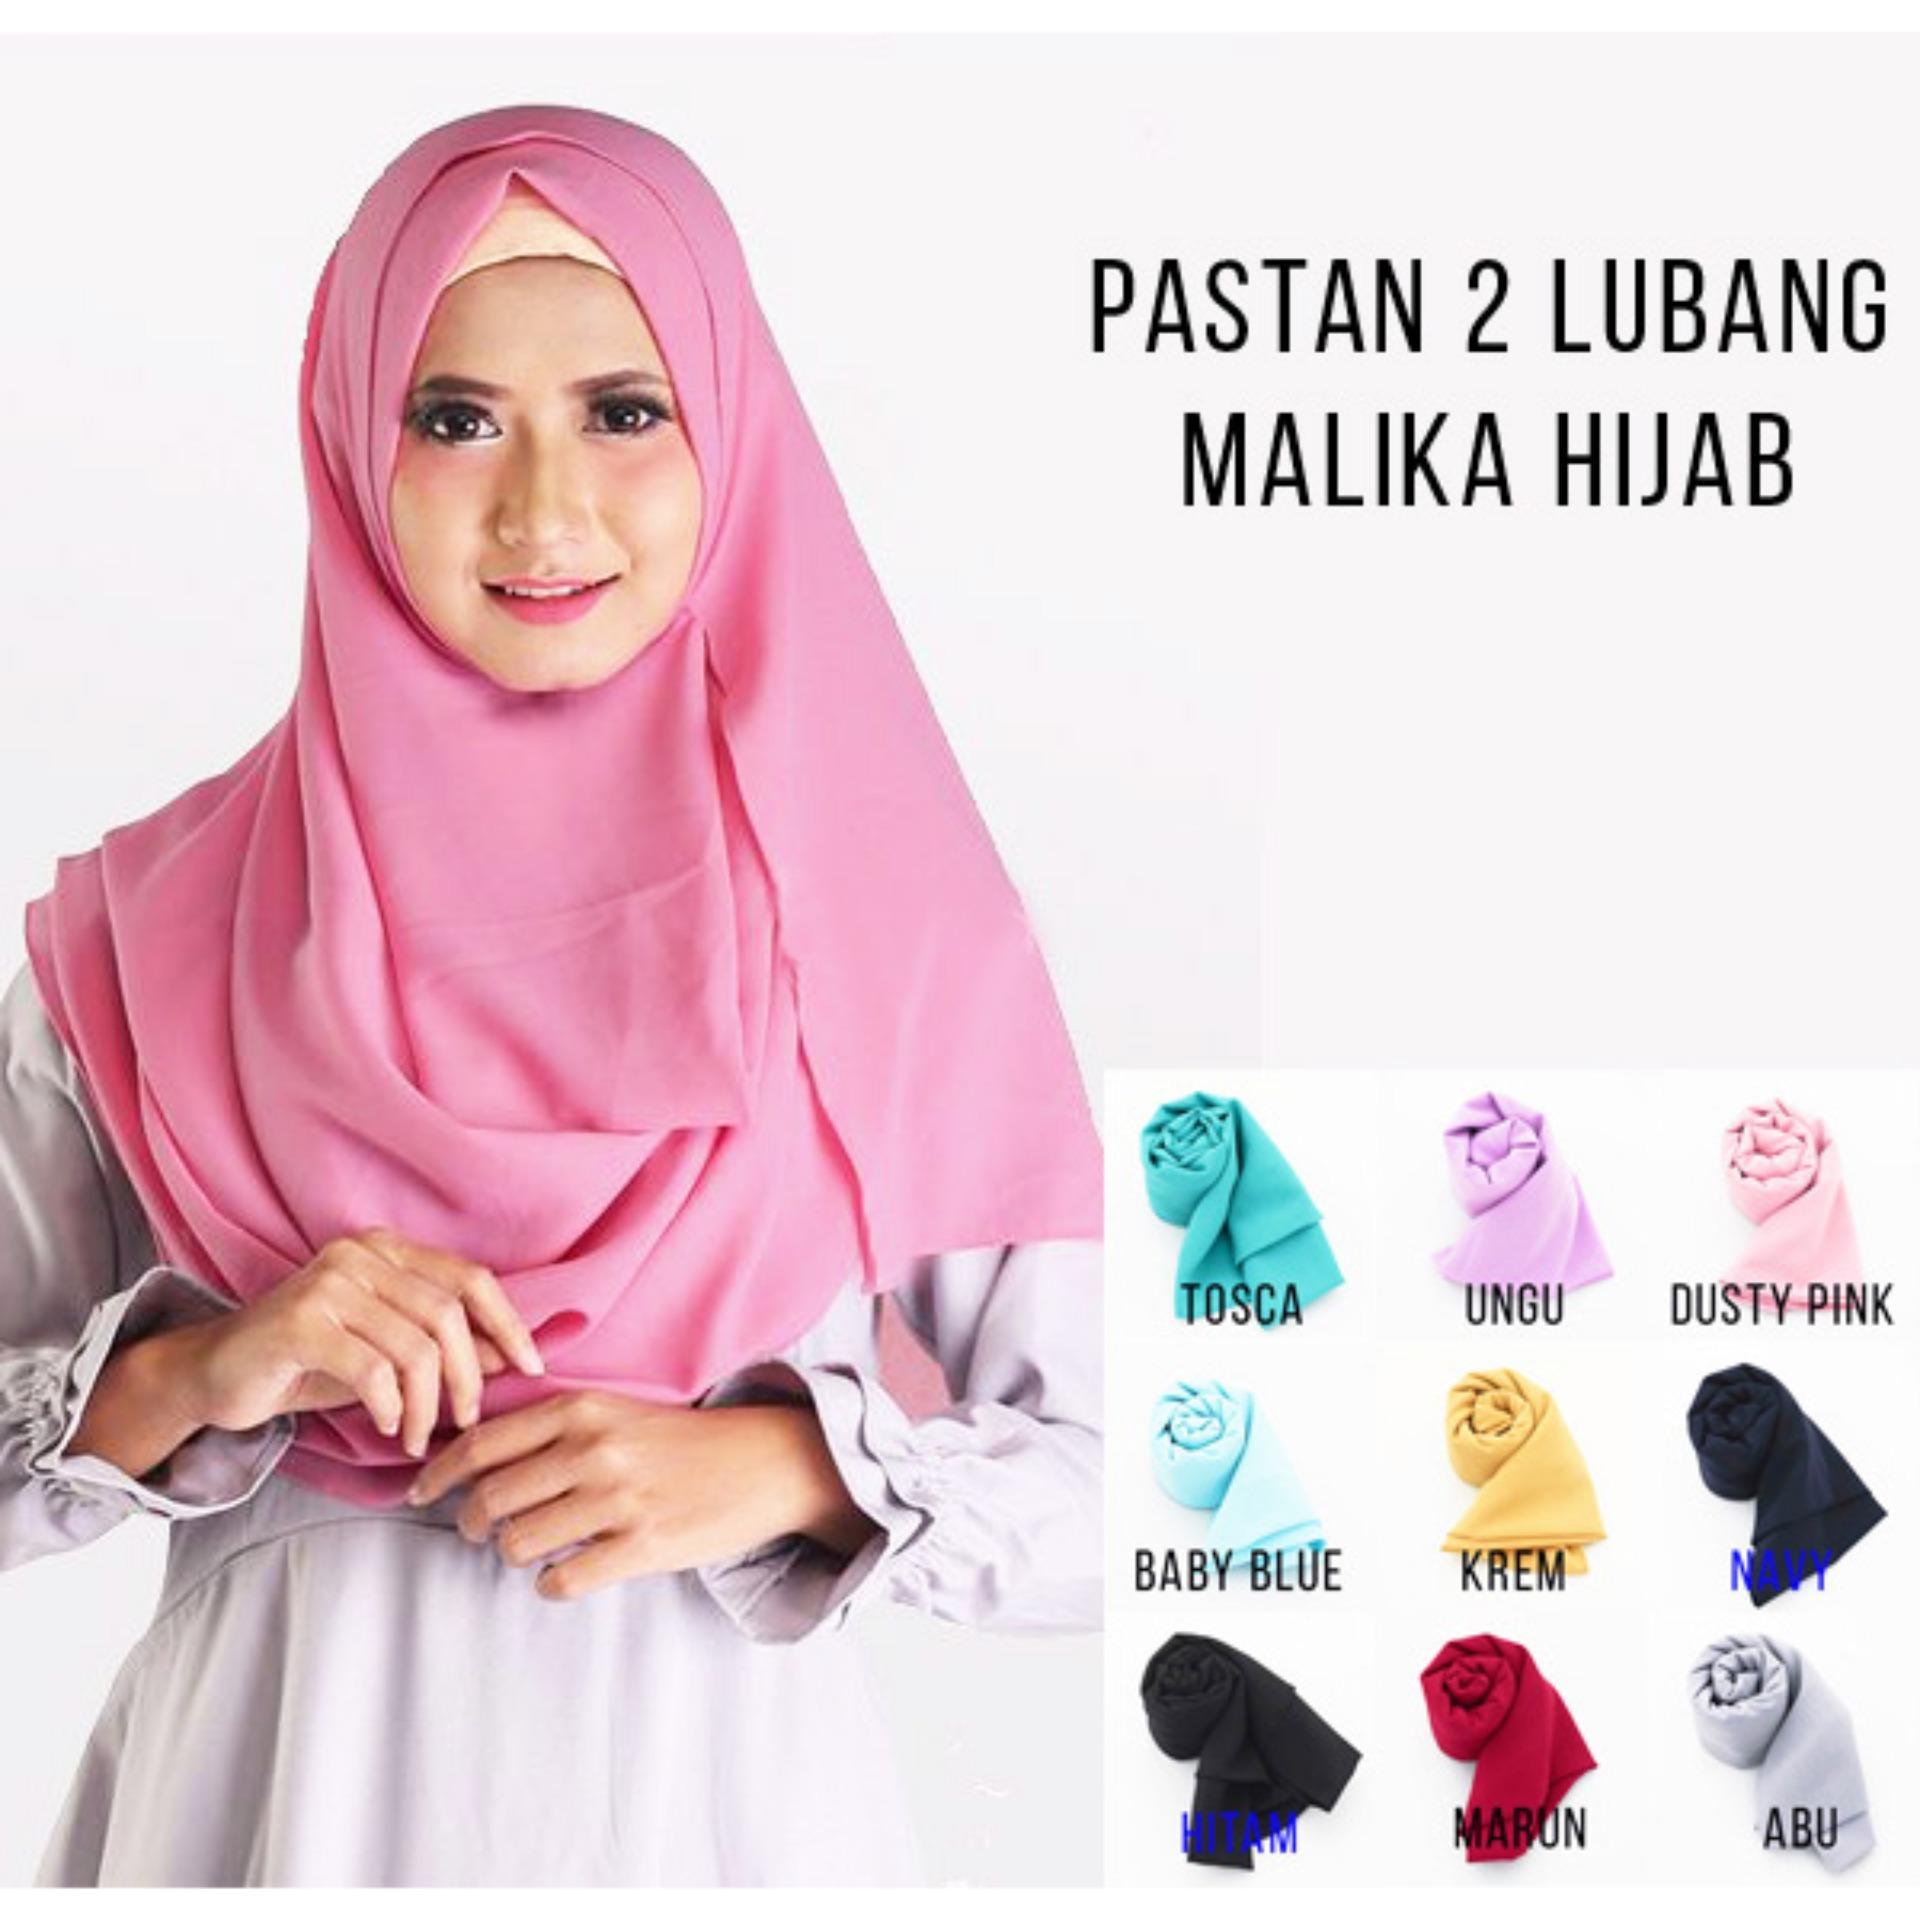 Malika Jualan Online Teraman Dan Terpercaya Hijab New Voal Segiempat Exlusive Print Maxmara Limited Pastan Loop 2 Lubang Pashmina Khimar Kerudung Jilbab Instan Grosir